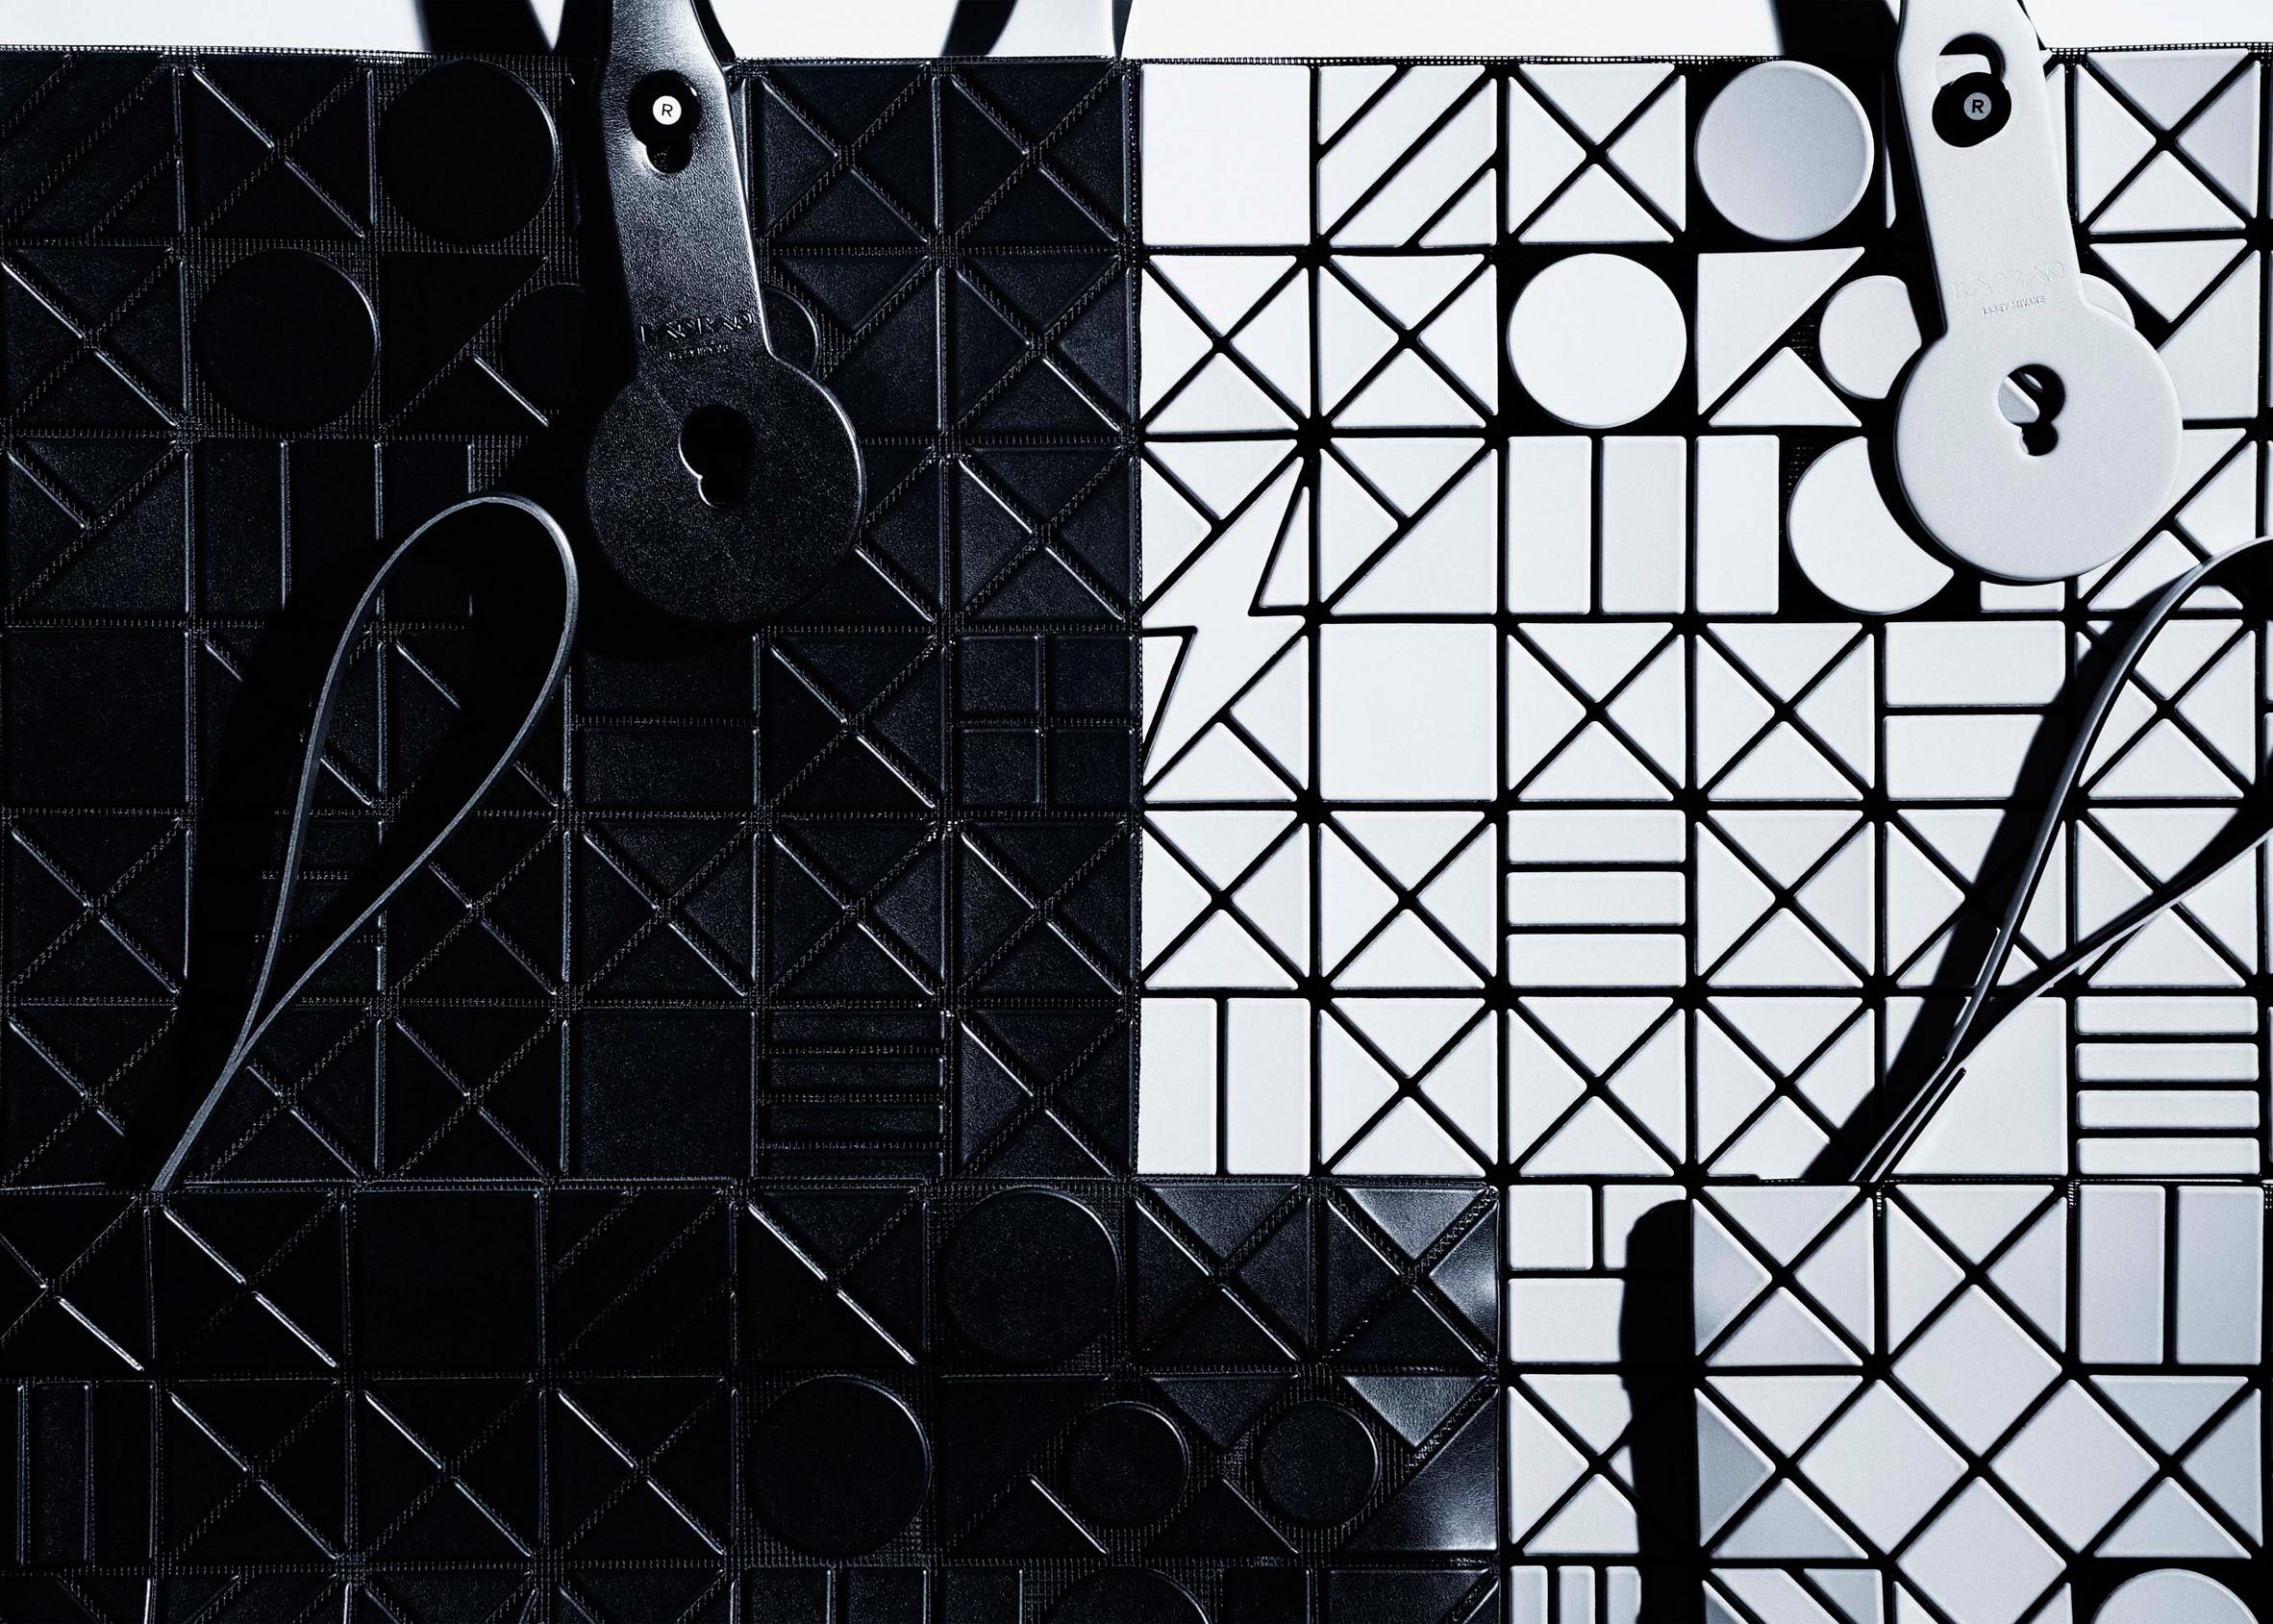 Issey Miyake updates iconic Bao Bao bag with new shapes 3eb518e3e8d16